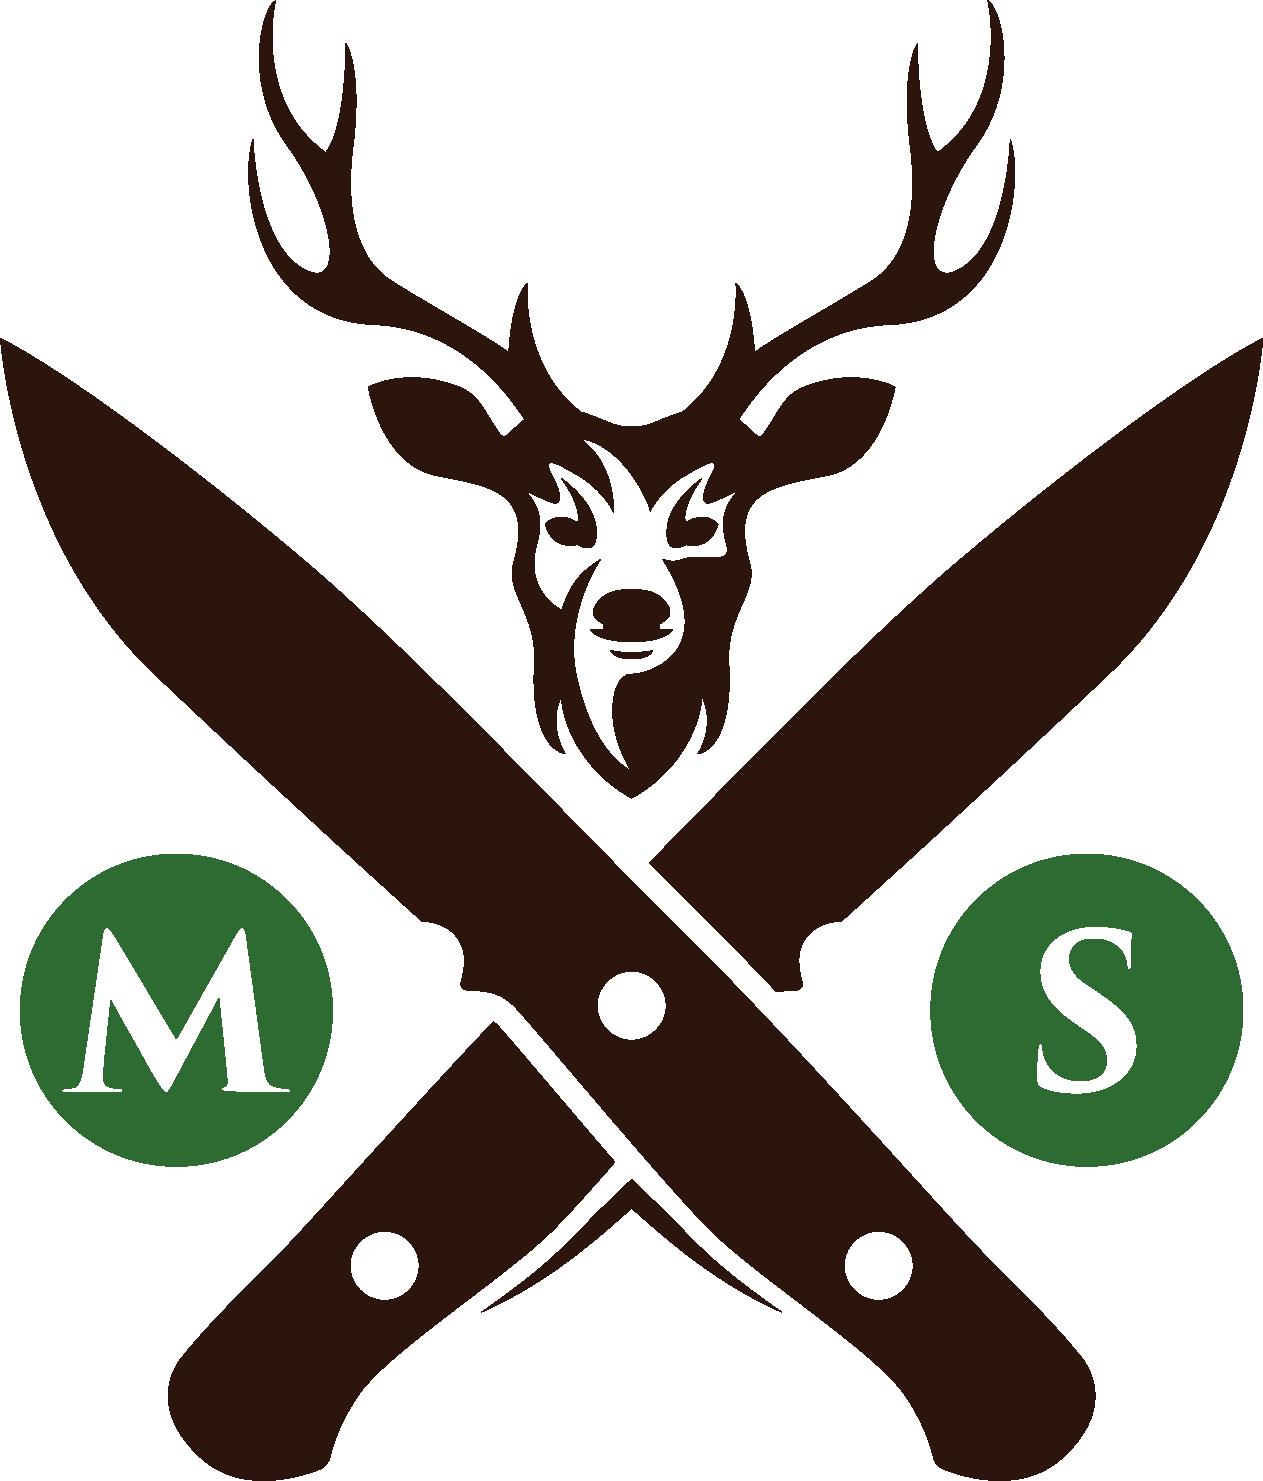 Messershop-logo-sign-final